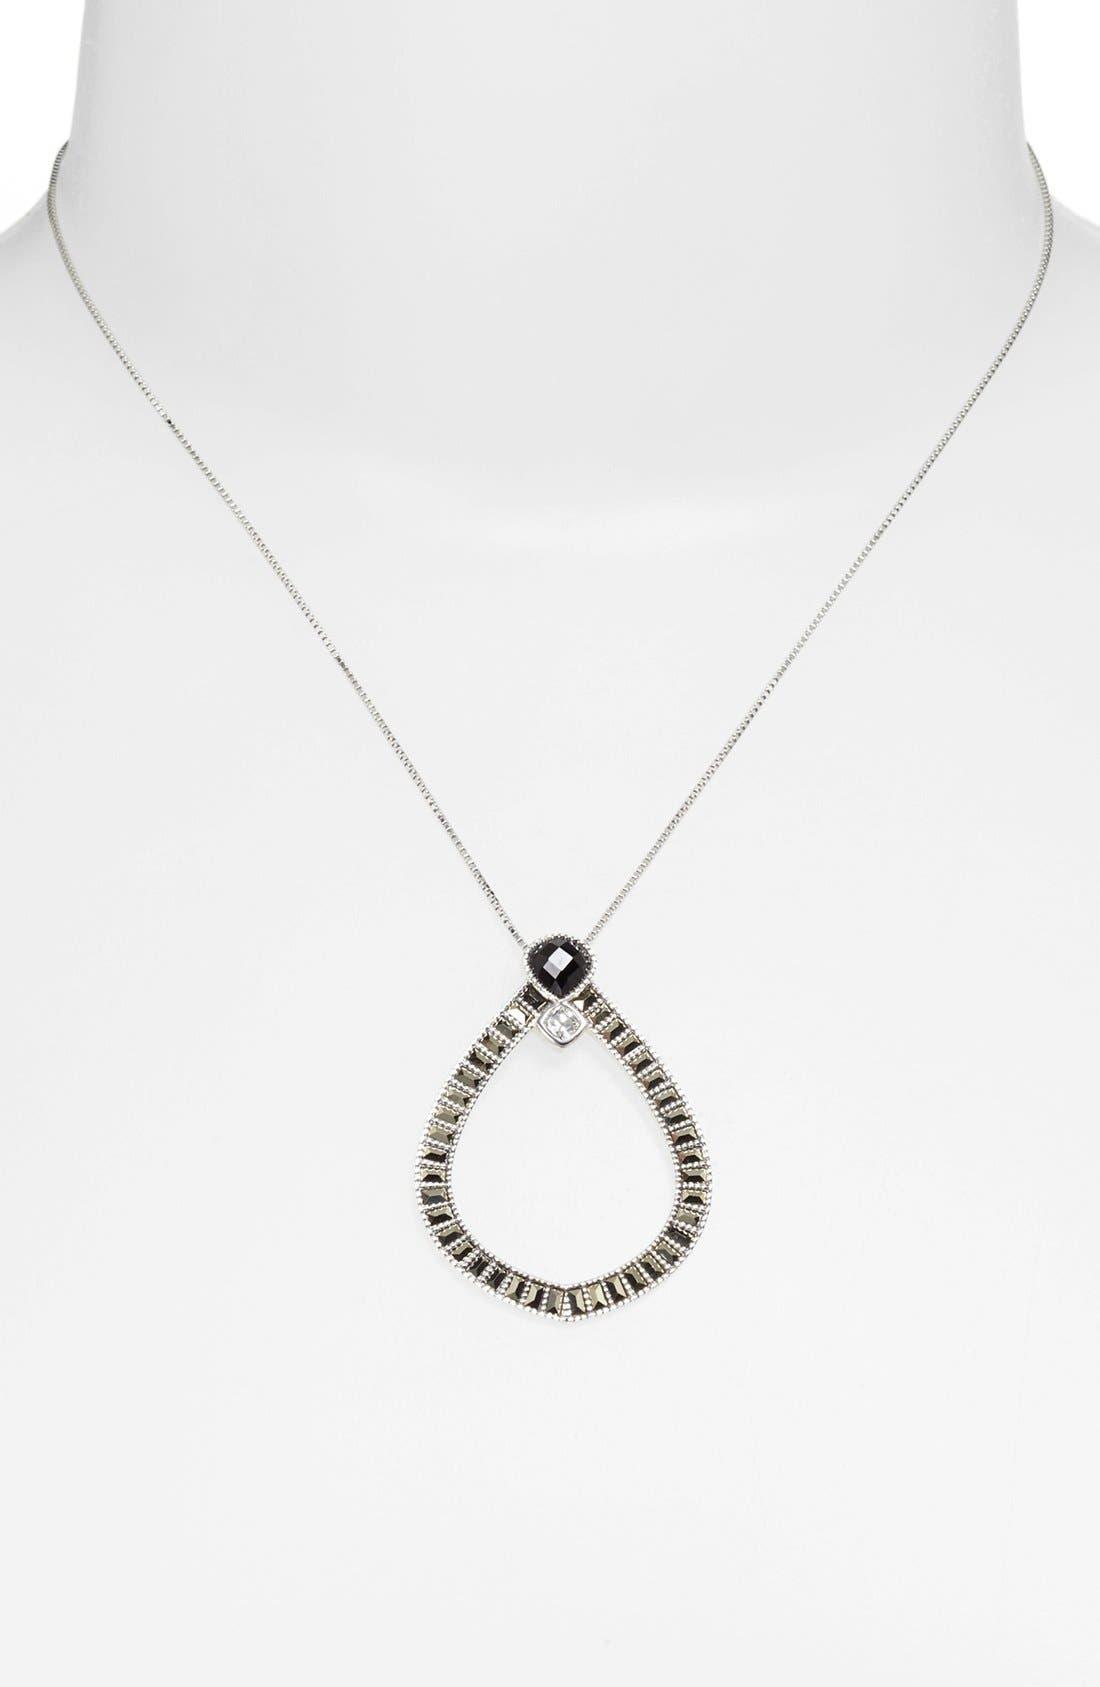 Alternate Image 1 Selected - Judith Jack Open Pendant Necklace